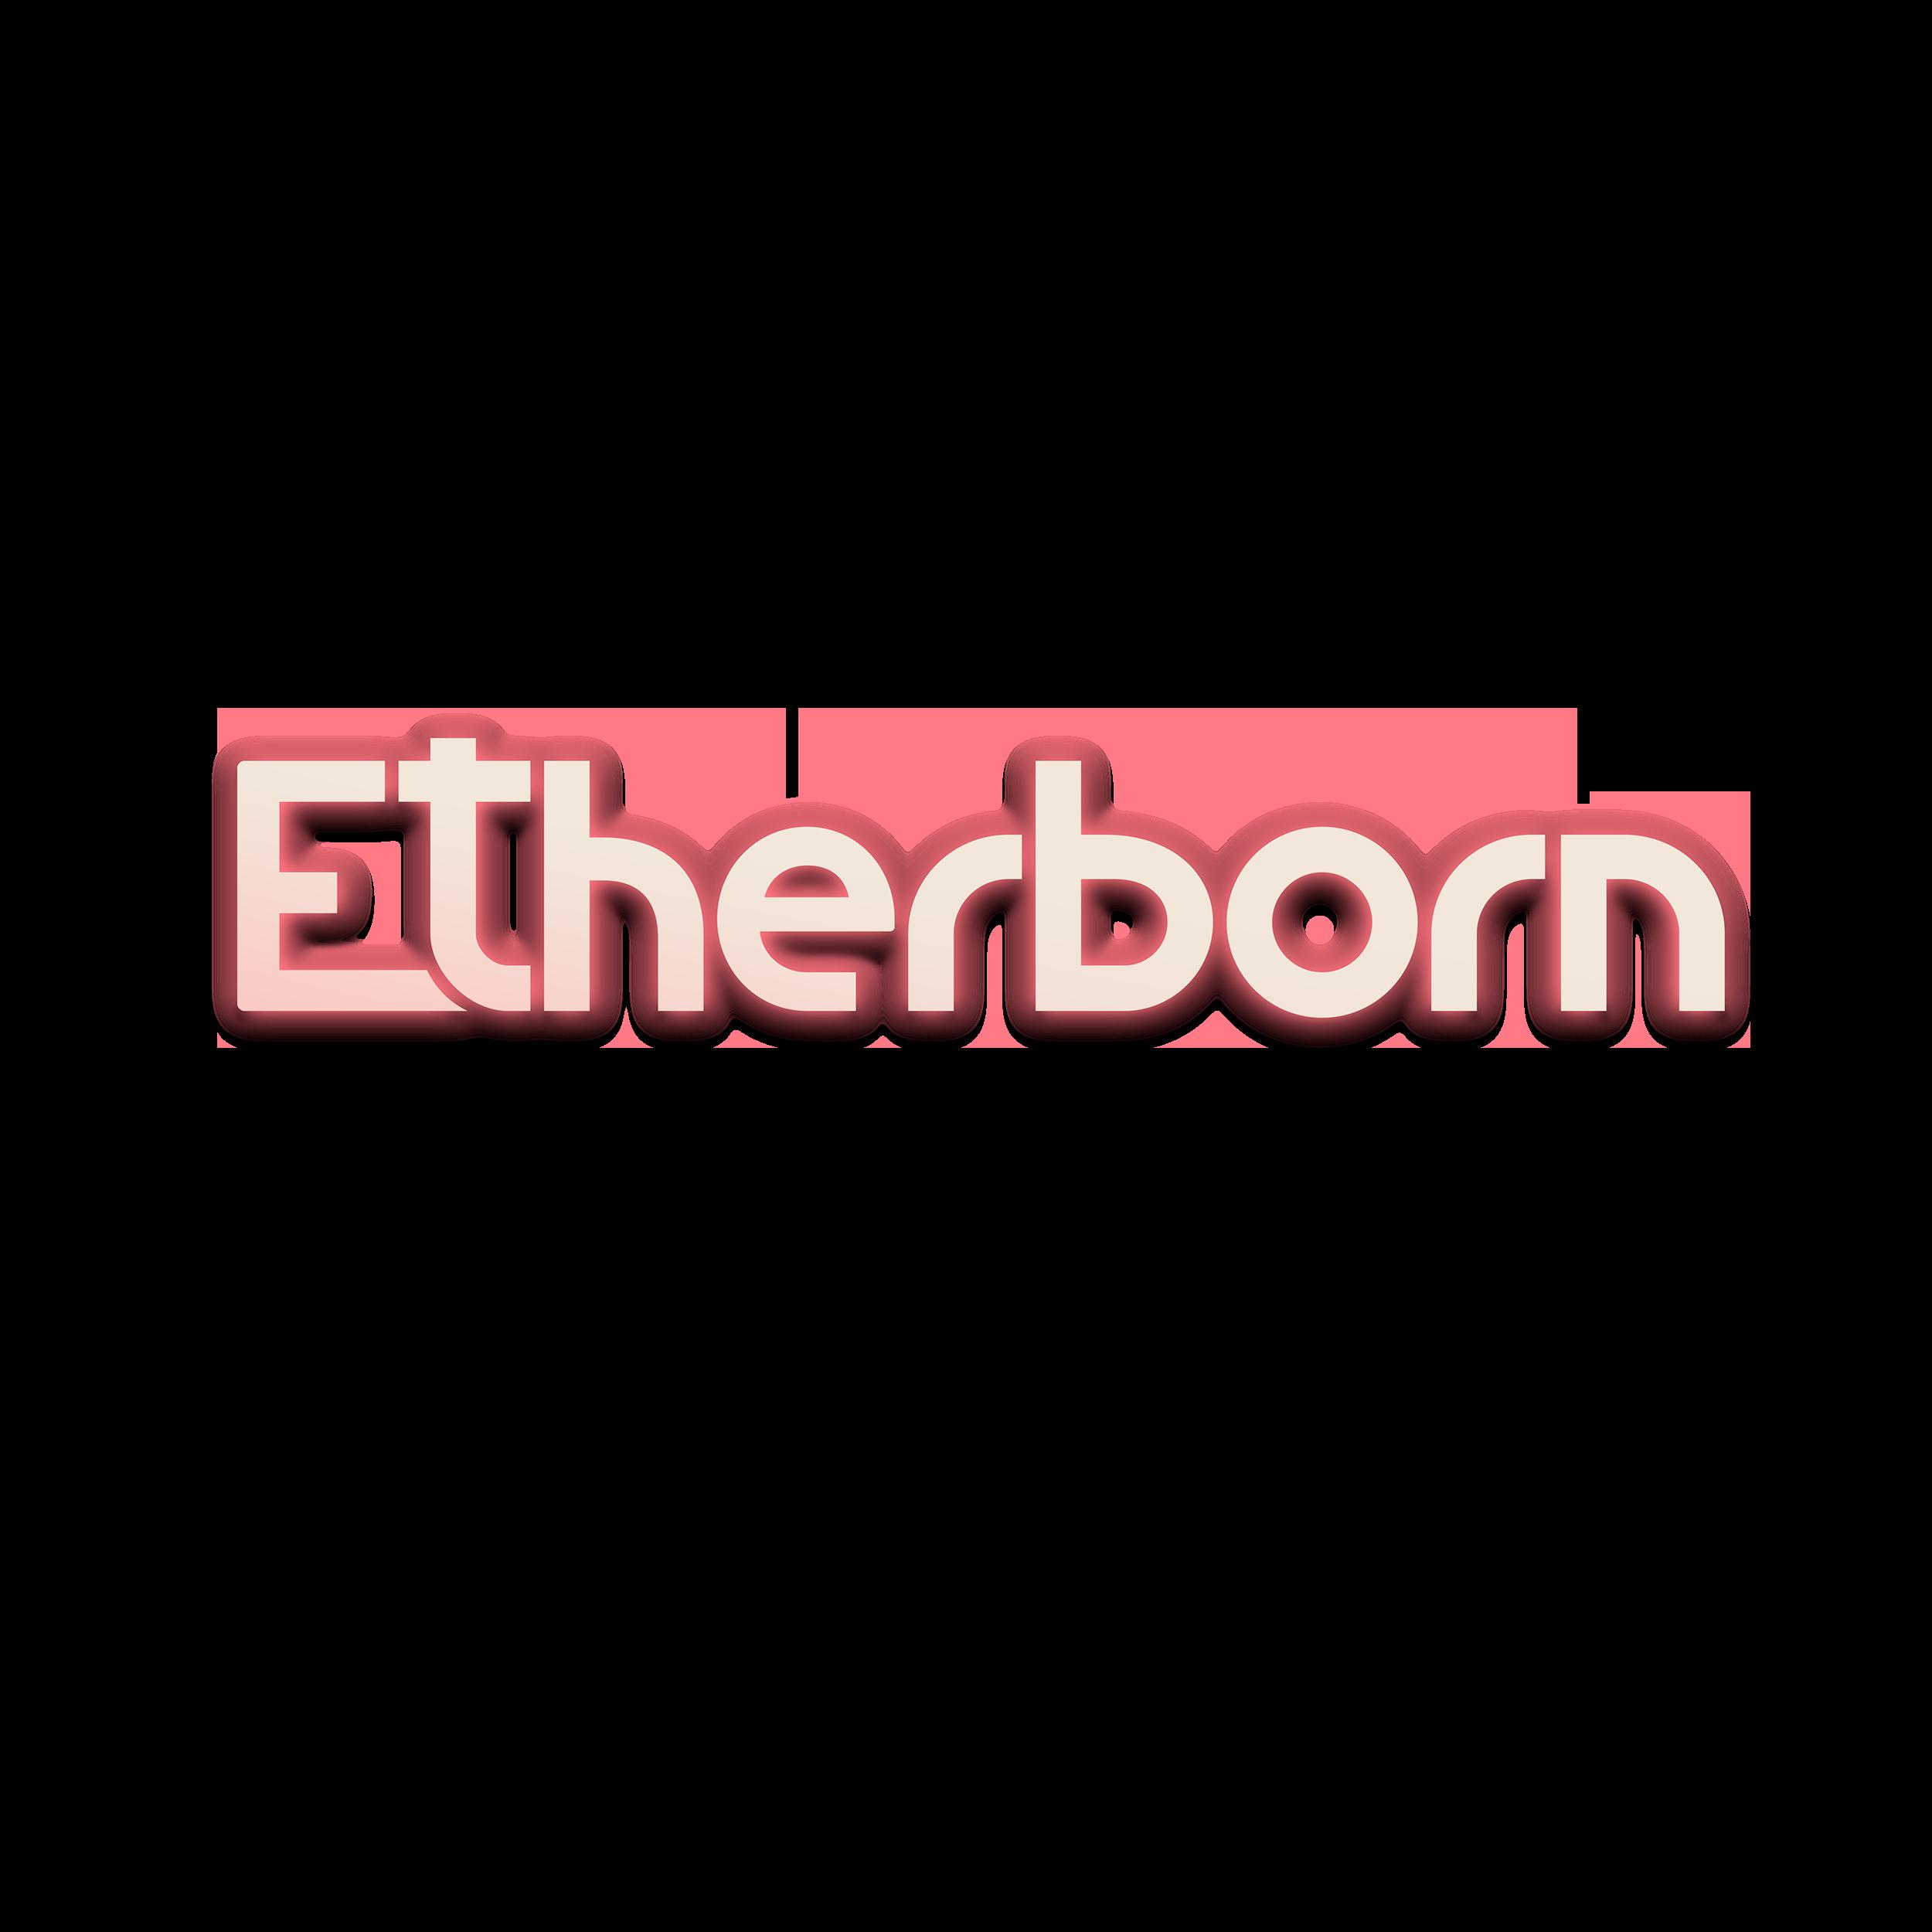 Etherborn logo